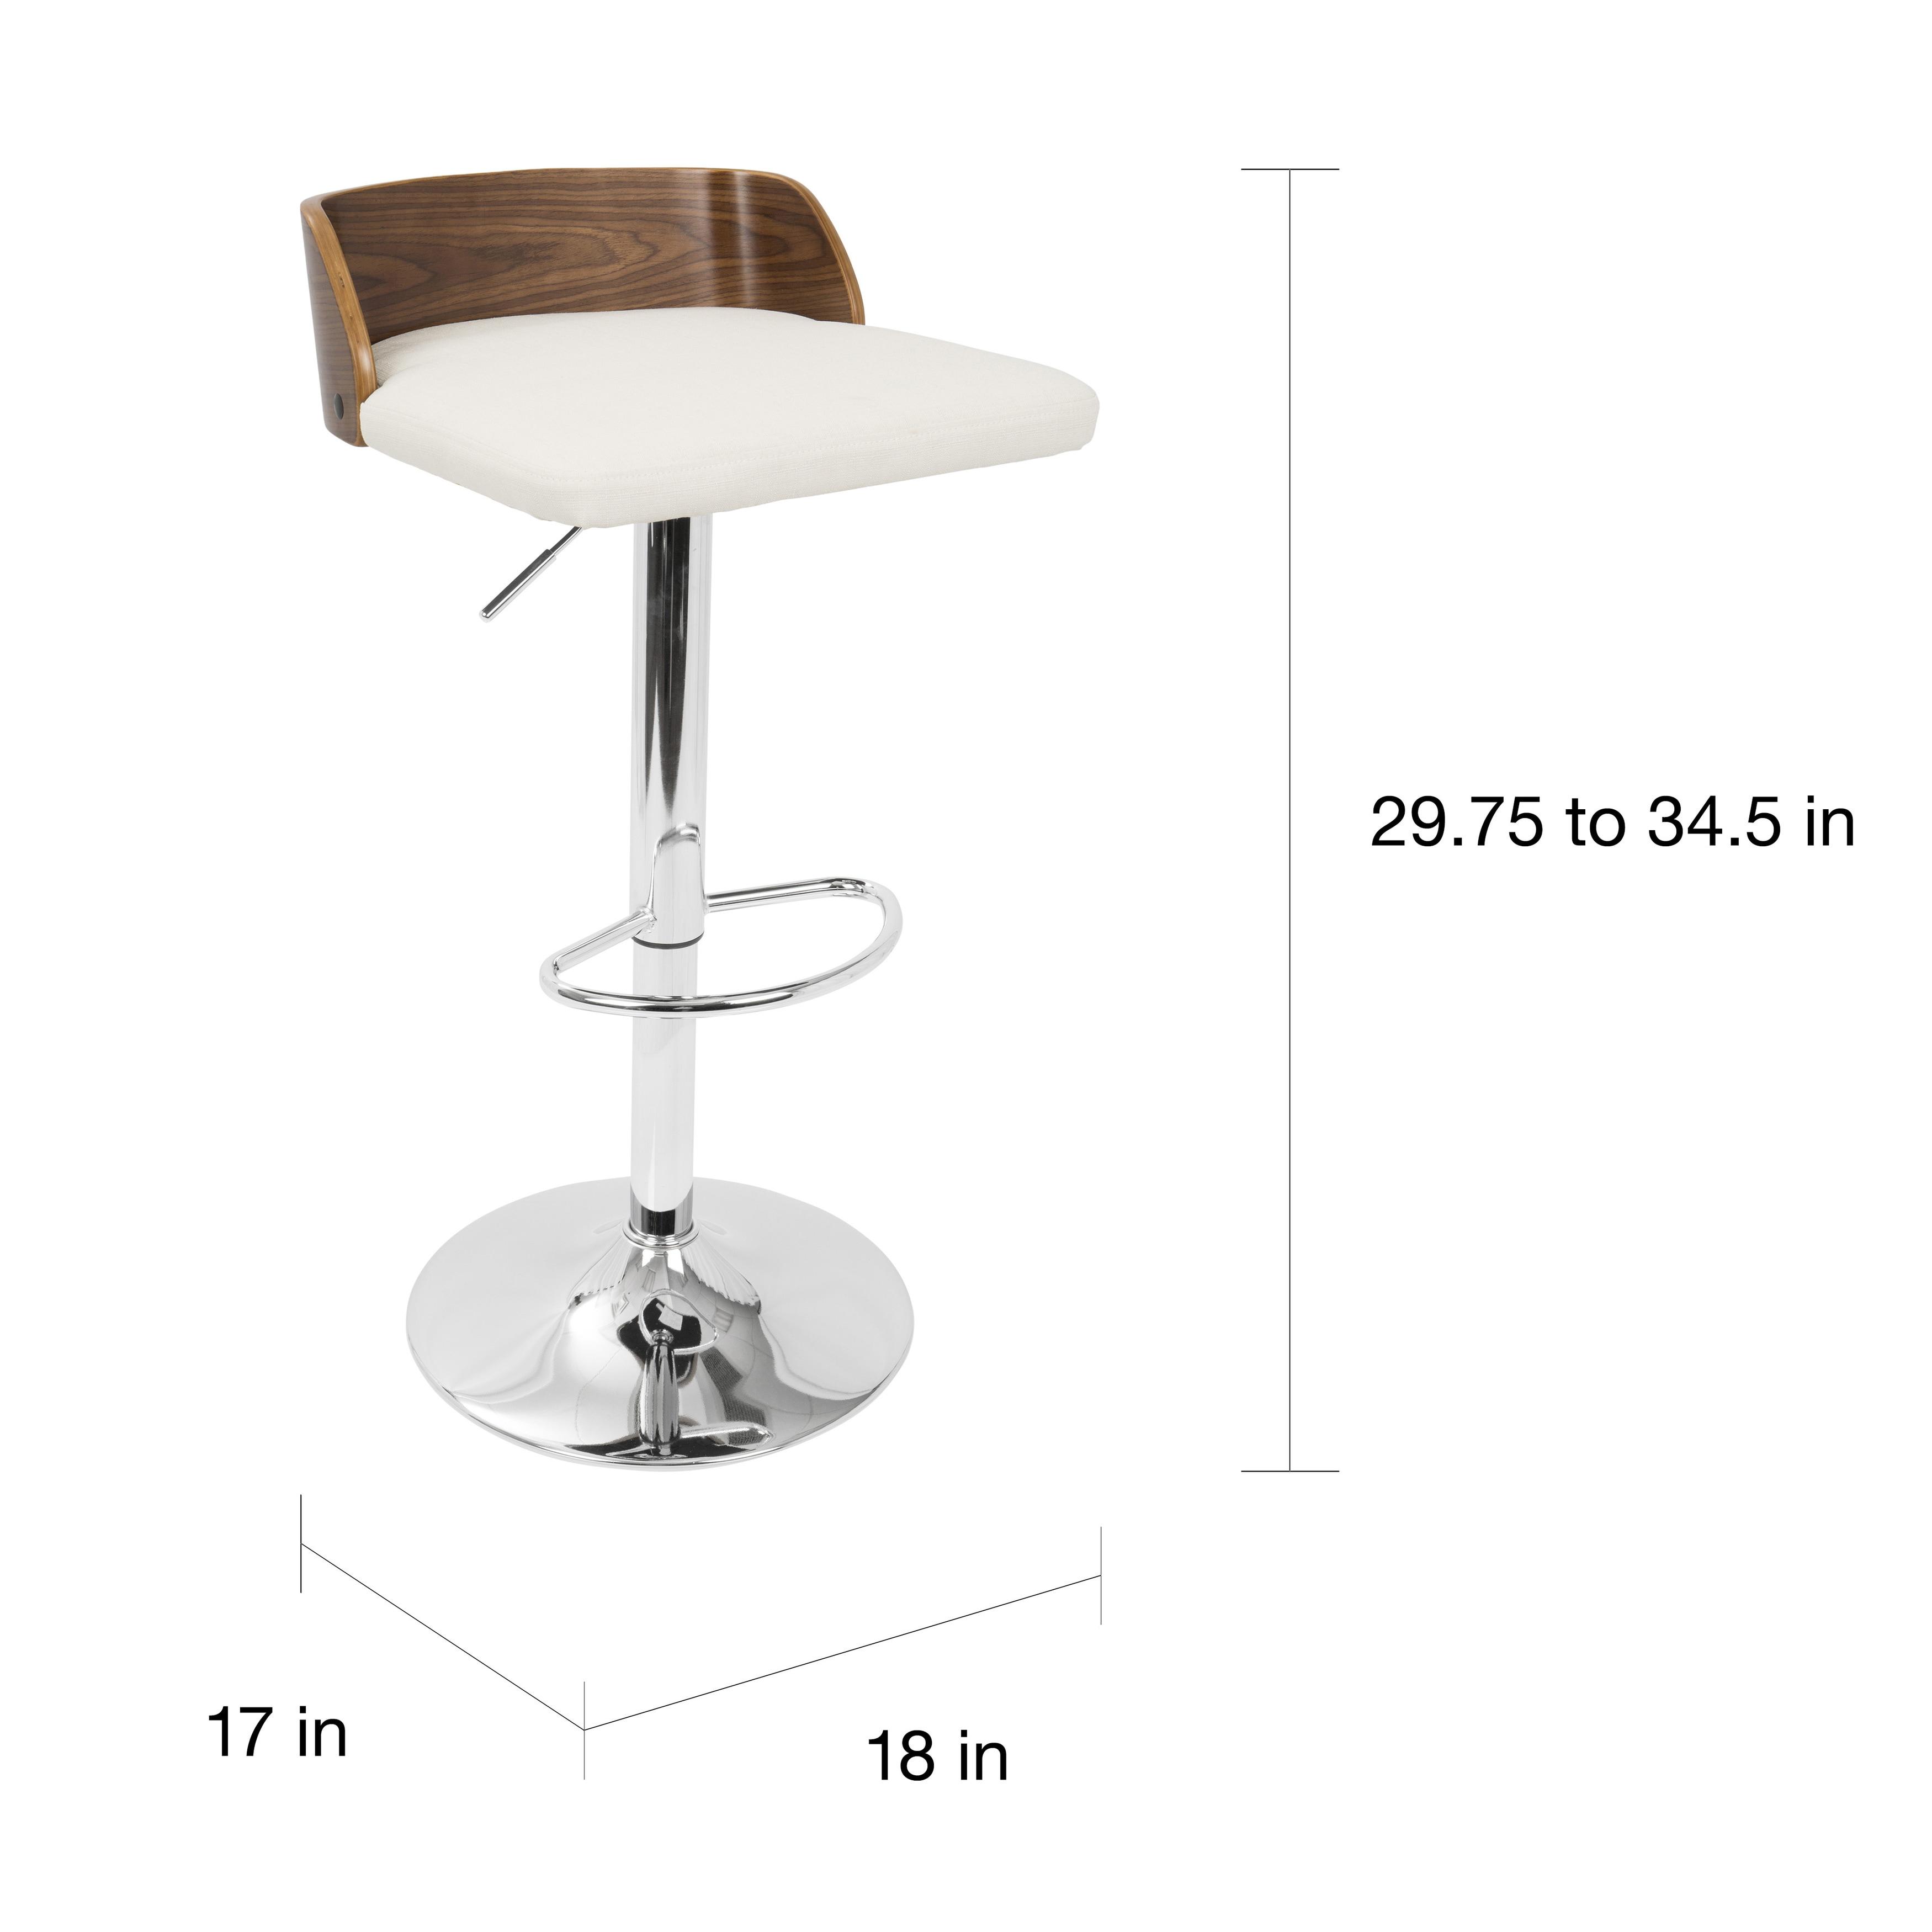 Miraculous Carson Carrington Marstrand Walnut Wood And Chrome Mid Century Modern Adjustable Barstool Evergreenethics Interior Chair Design Evergreenethicsorg